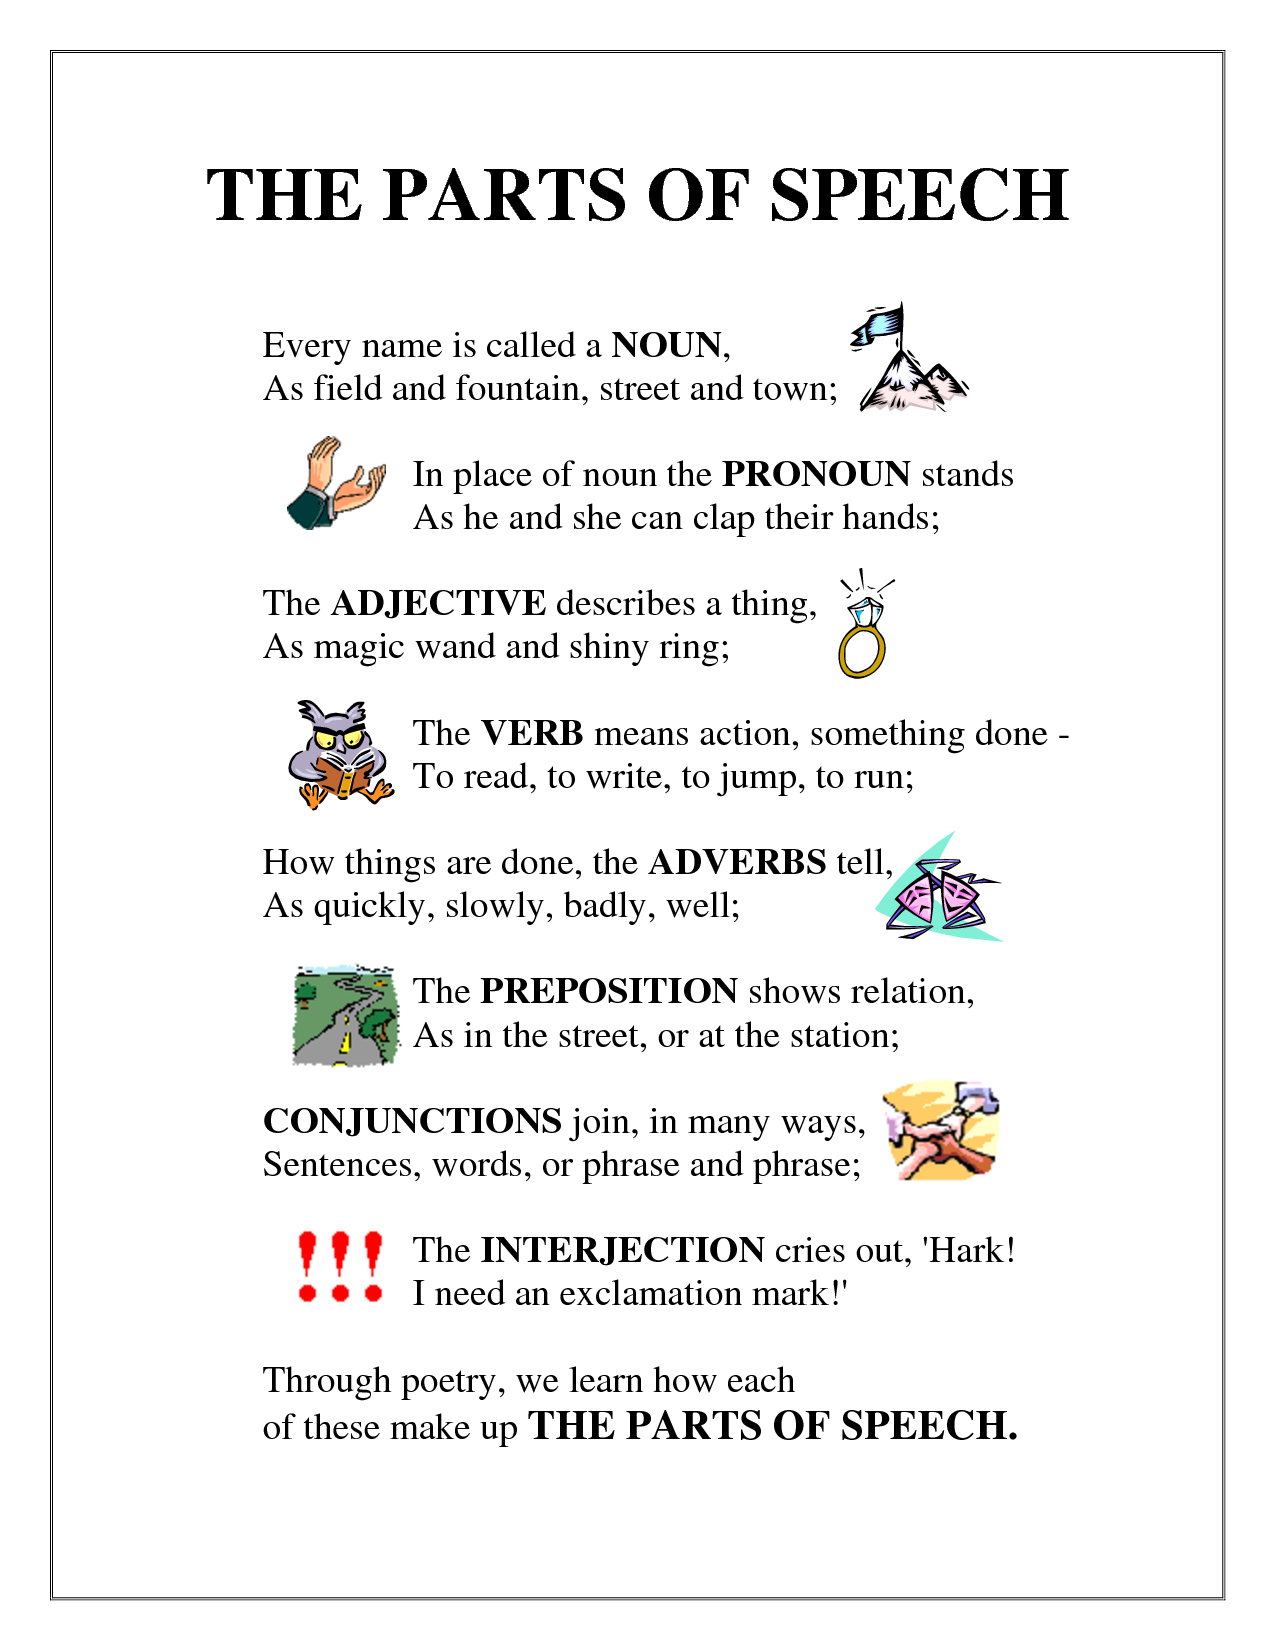 Despite - what part of speech 28